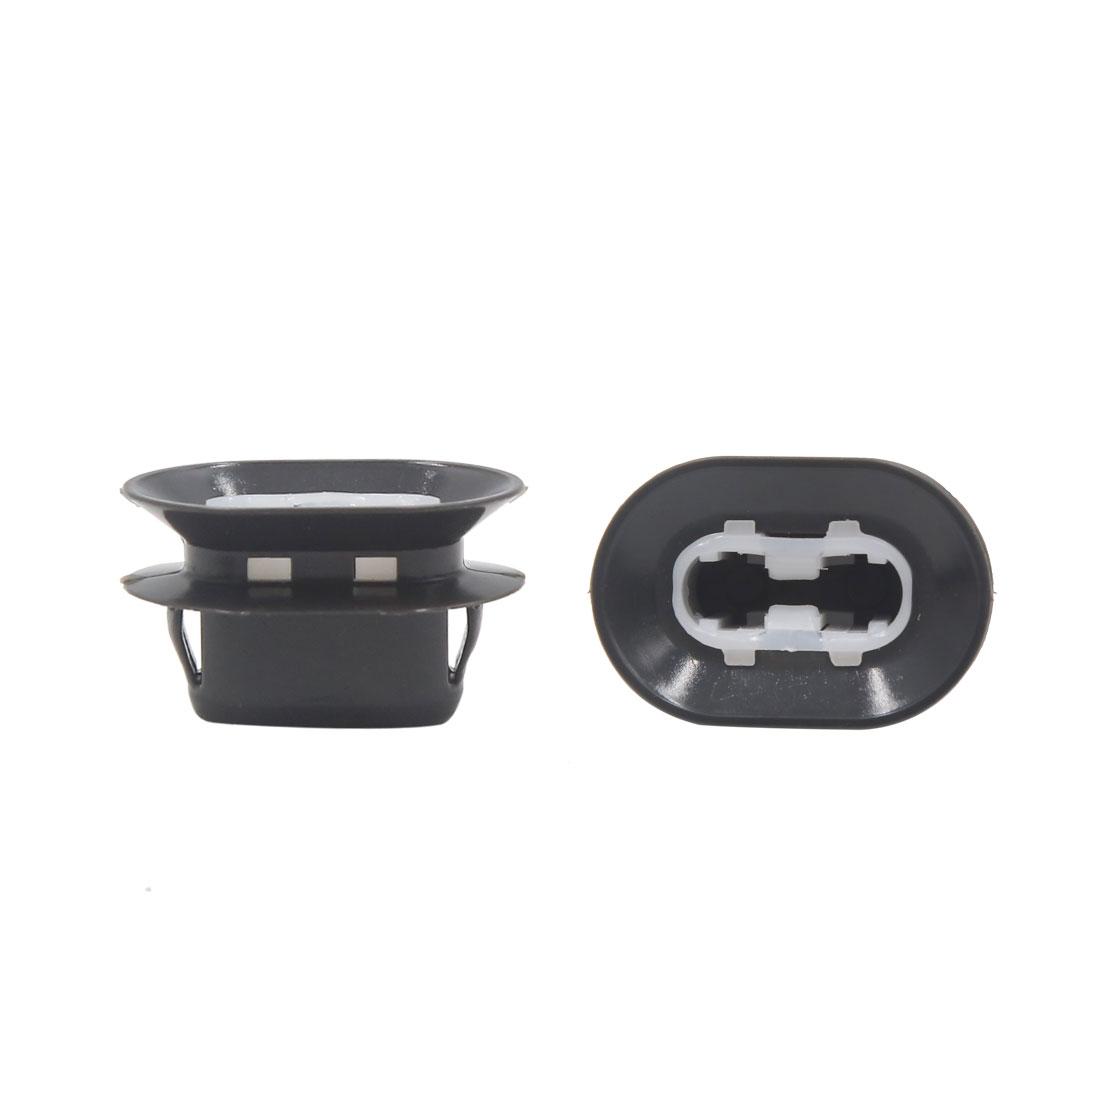 10 Pcs Universal Black Plastic Retainer Seat Buckle Clip for Car Vehicle